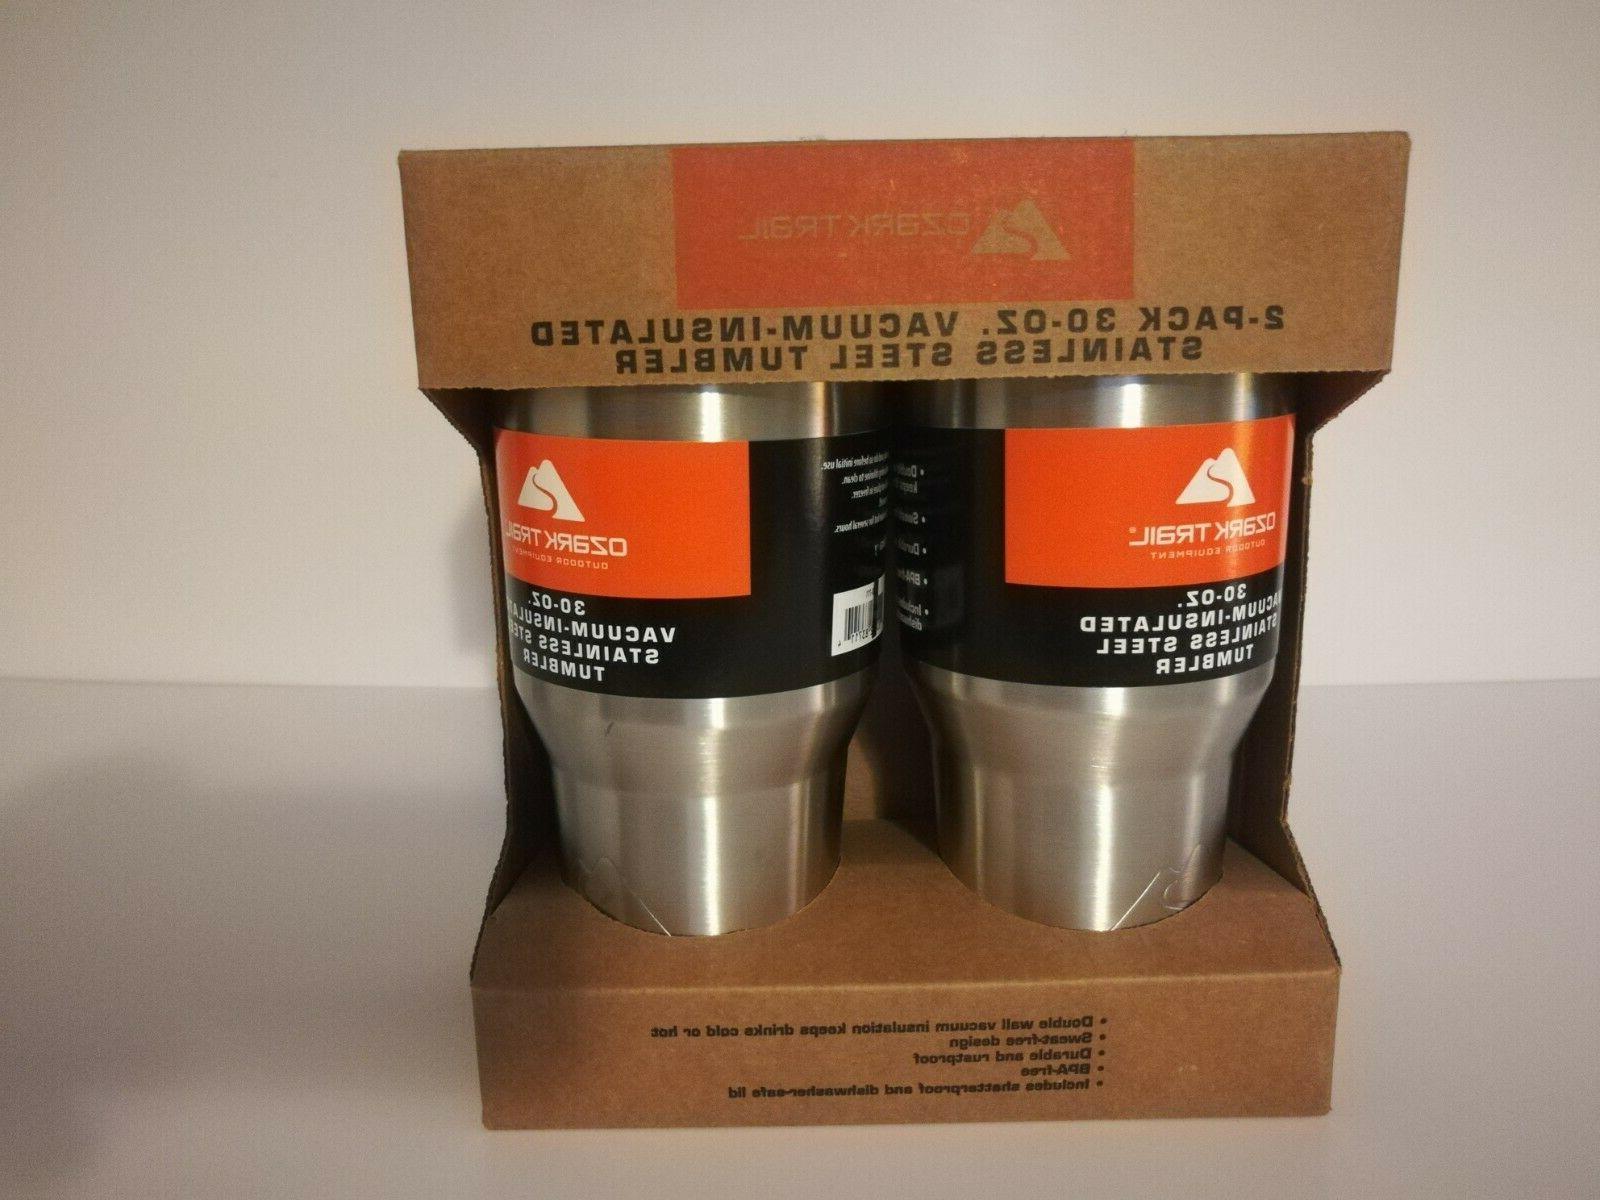 NEW Ozark Trail Pack oz Vacuum Insulated Stainless Steel Tumbler Coffee Mug